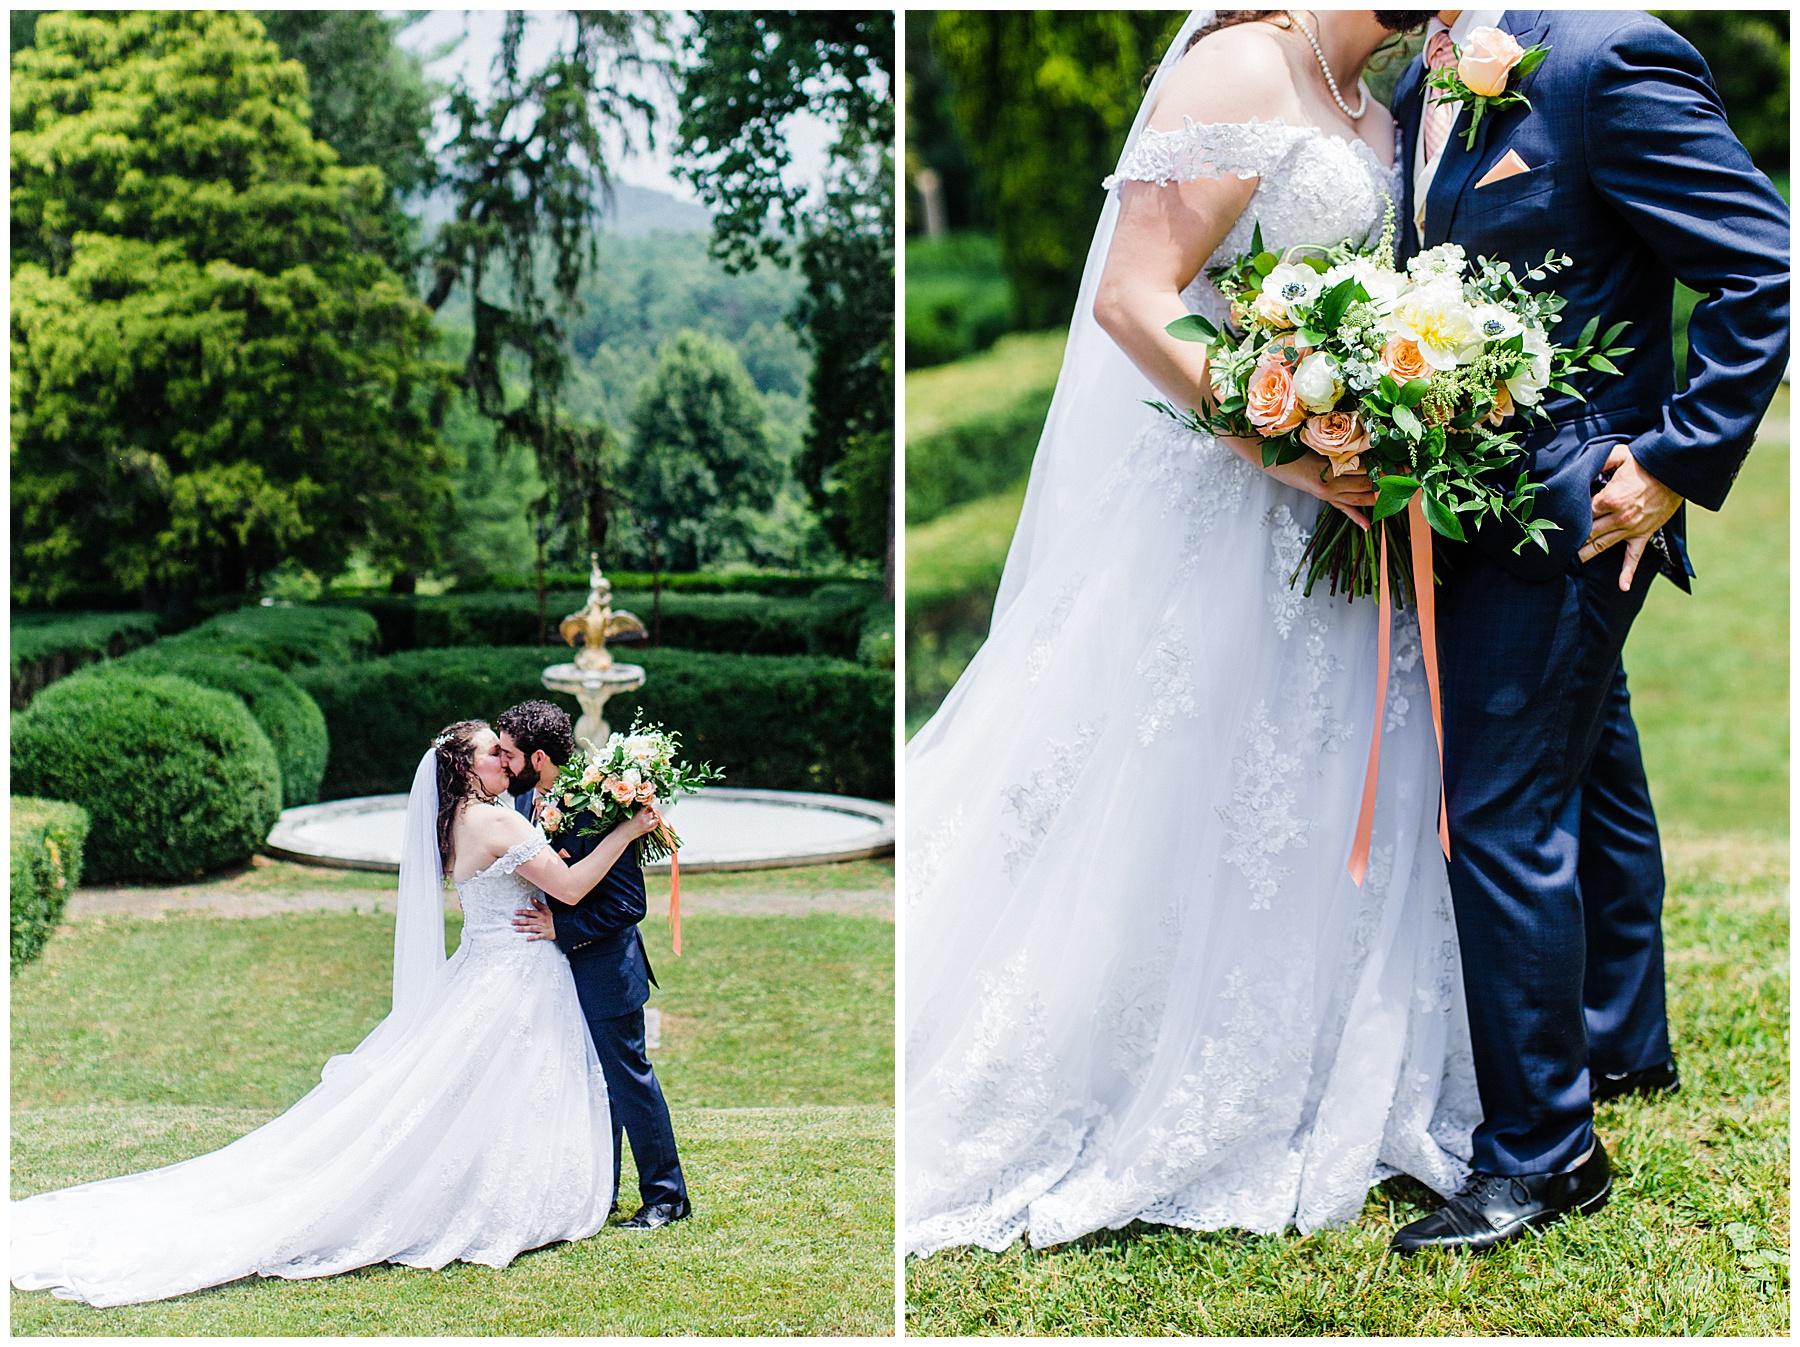 oak-ridge-estate-wedding-virginia-photographer17.jpg